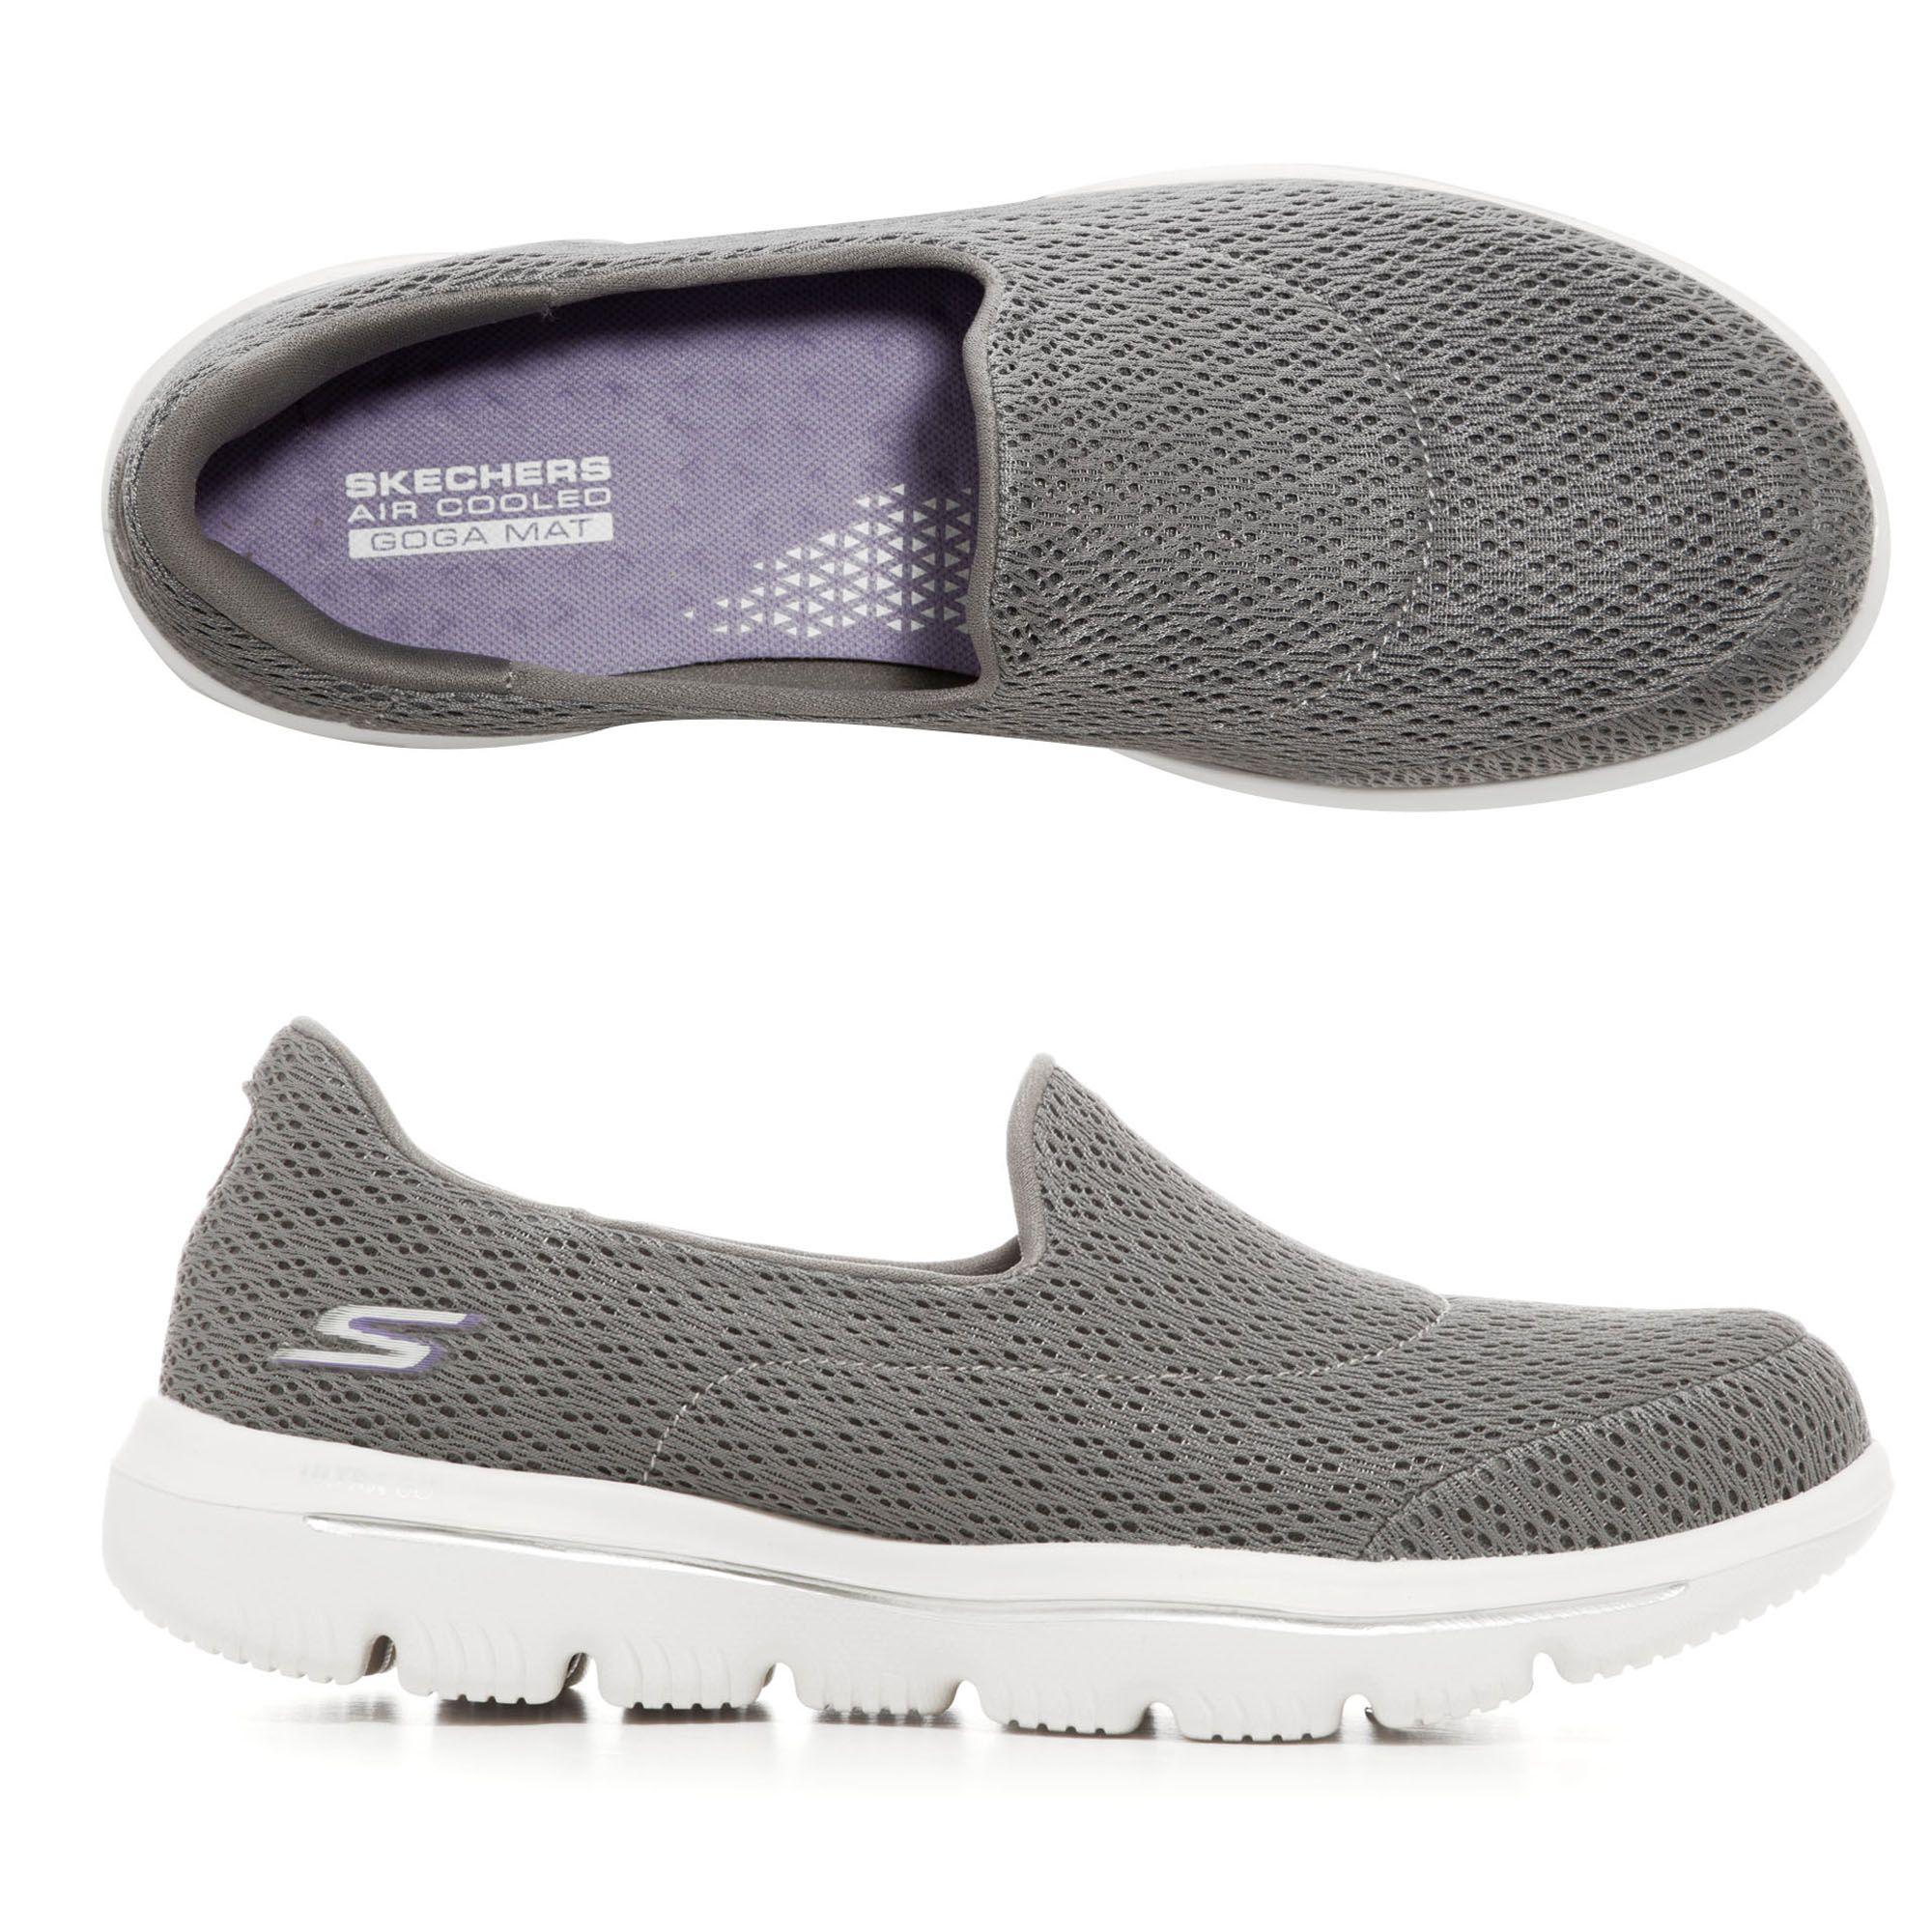 SKECHERS Damen Slipper Go Walk Textil & Mesh Goga Mat Technologie —